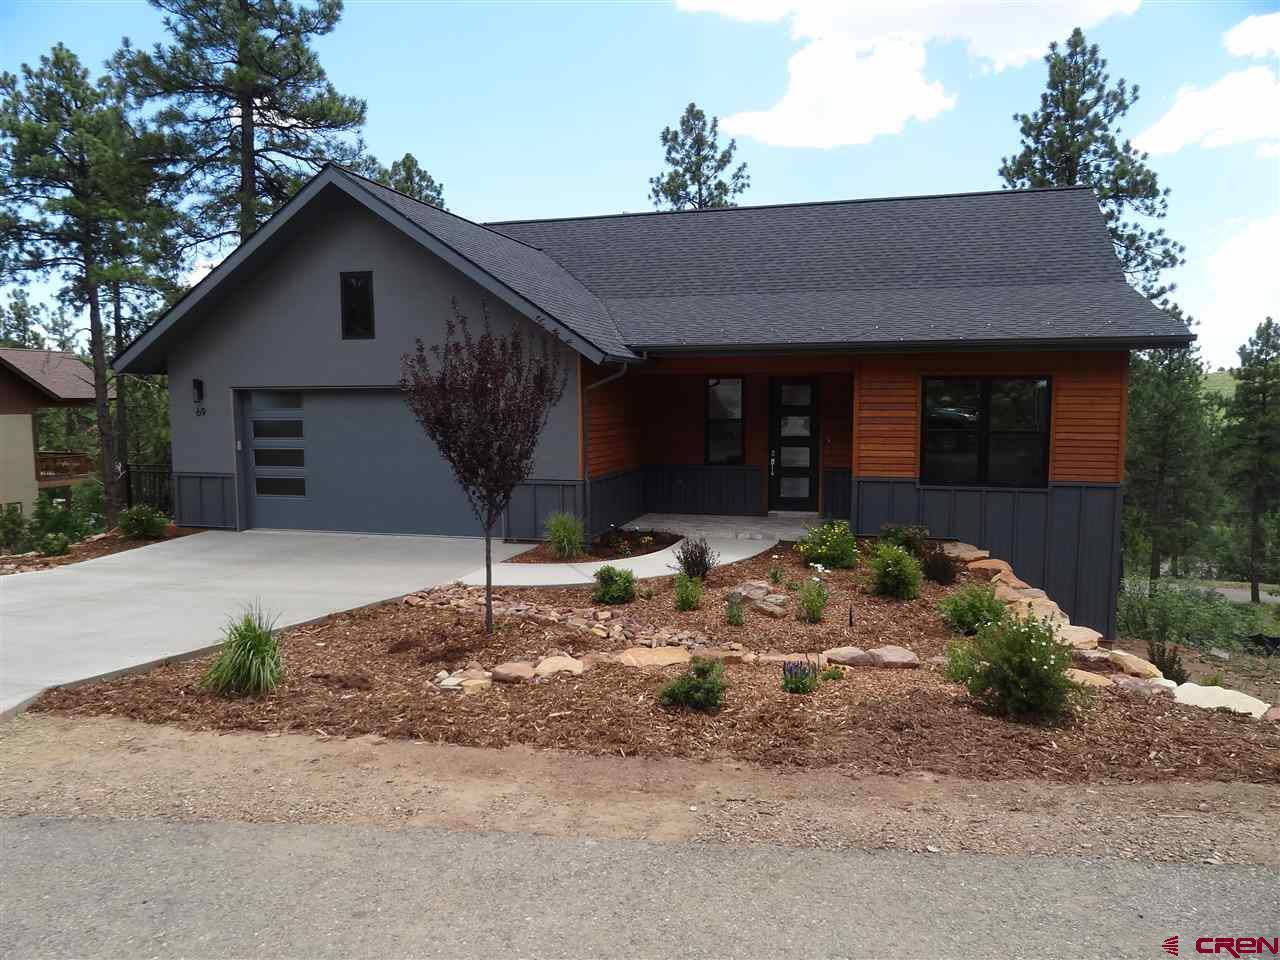 69 Snowslide Court, Durango, CO 81301